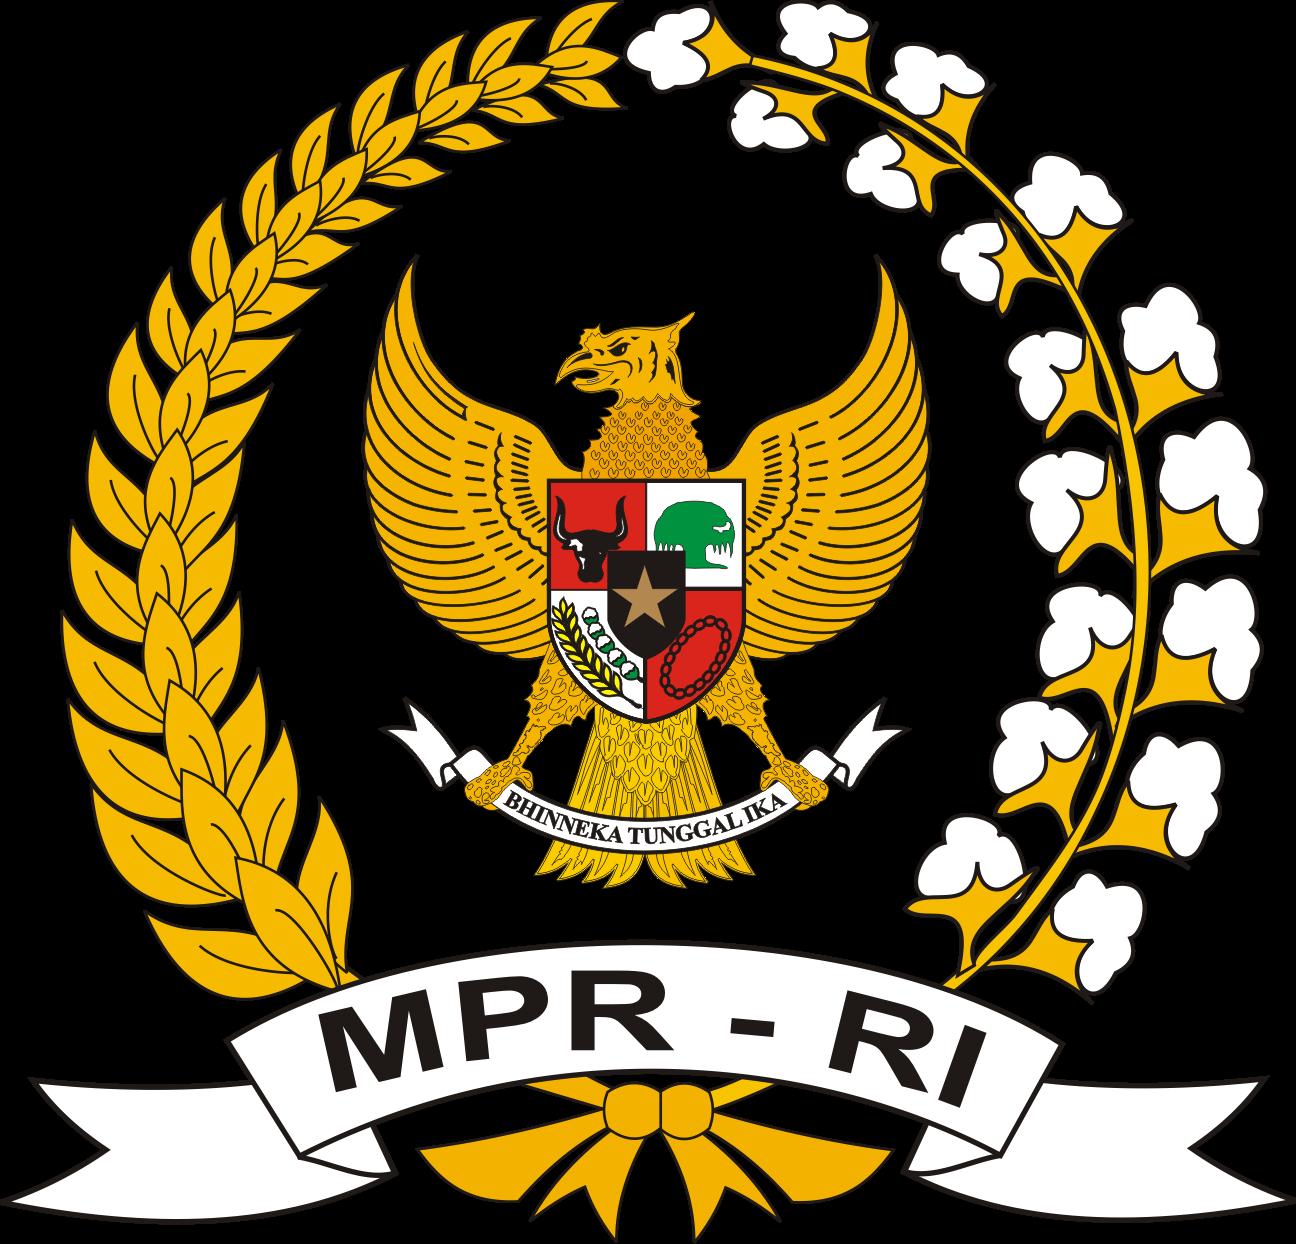 logo dpr mpr dan dpd ri kumpulan logo indonesia